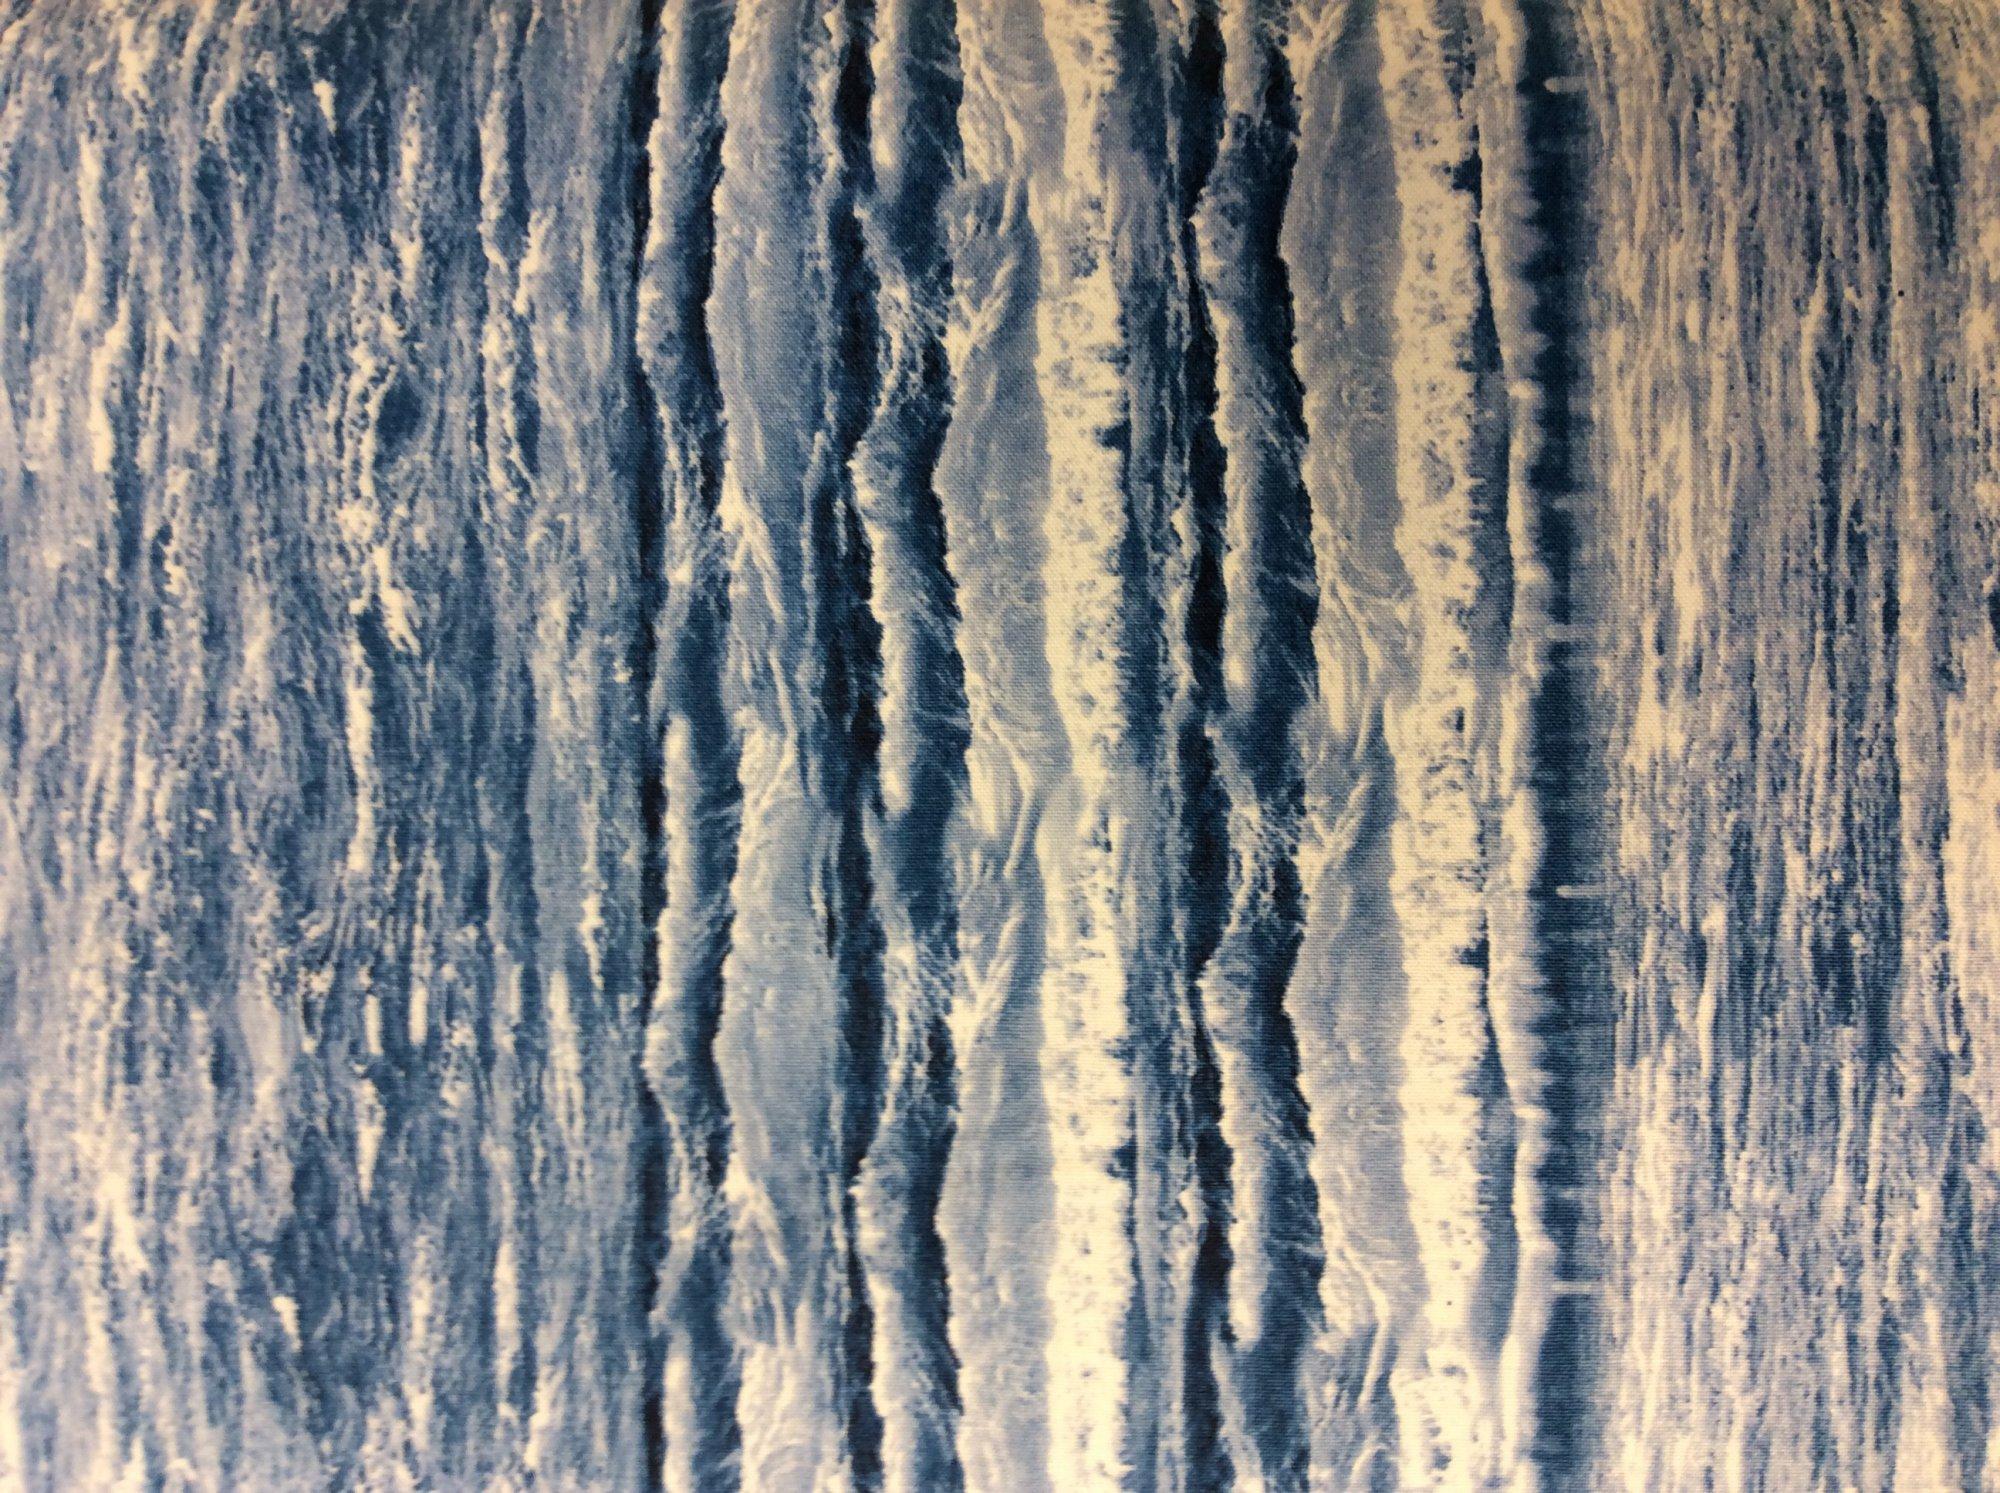 Danscapes Blue Waves